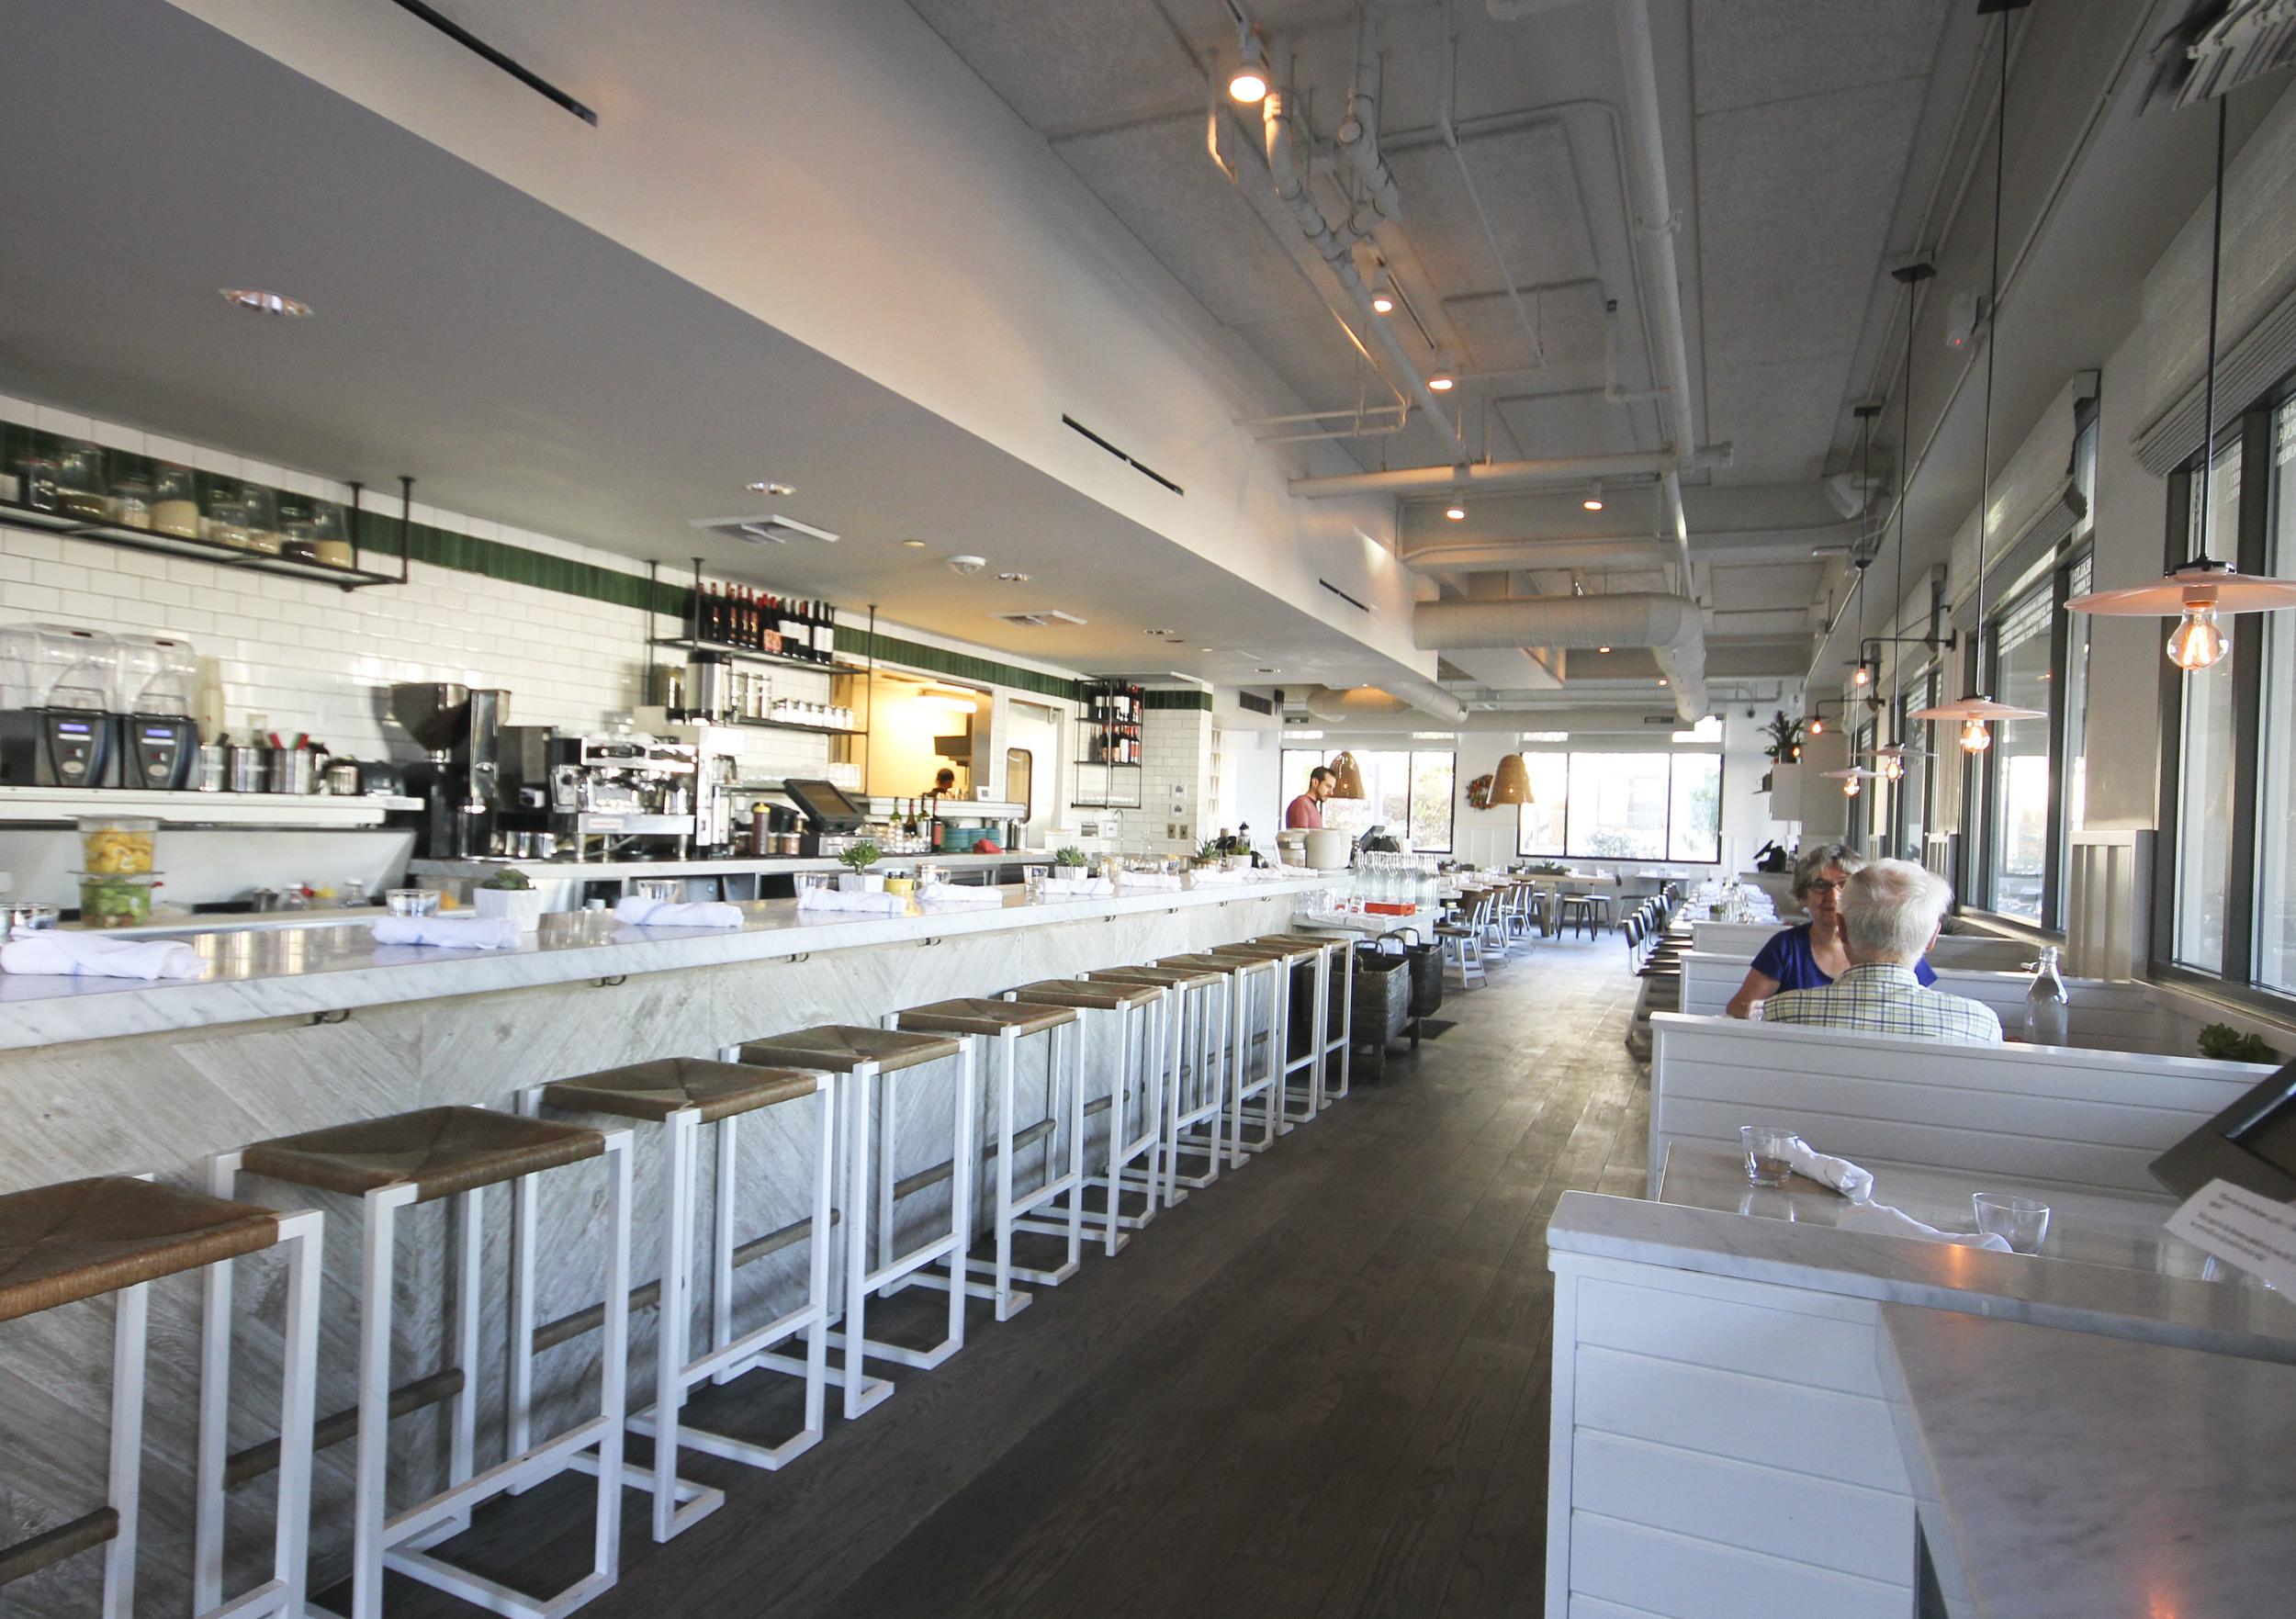 cafe gratitude vegan food venice los angeles USA2267.jpg